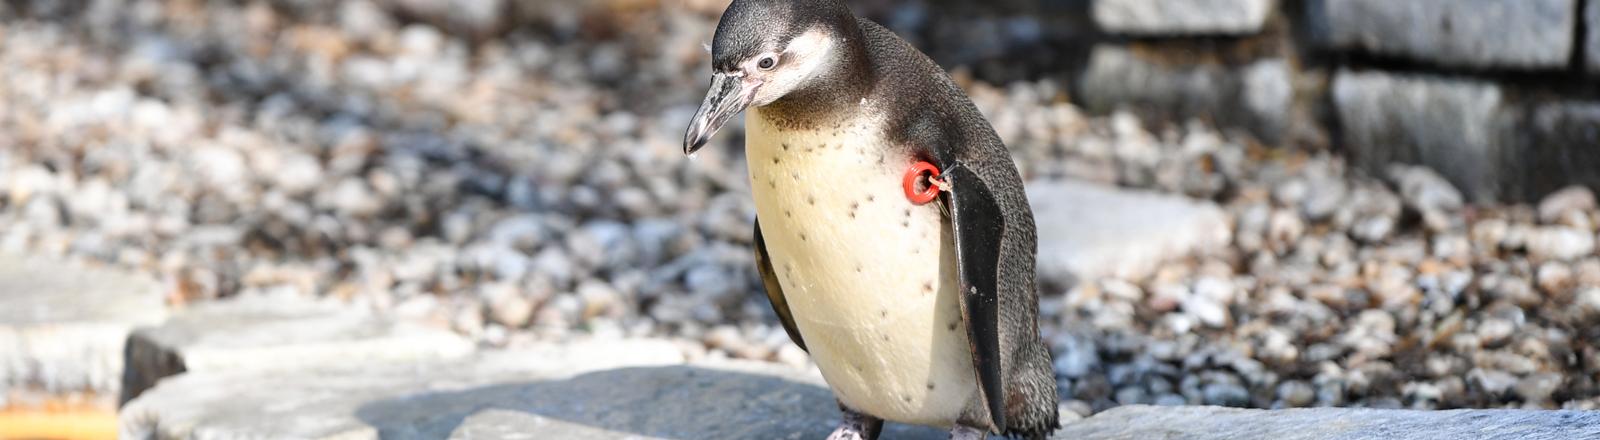 Pinguin in Mannheimer Tierpark